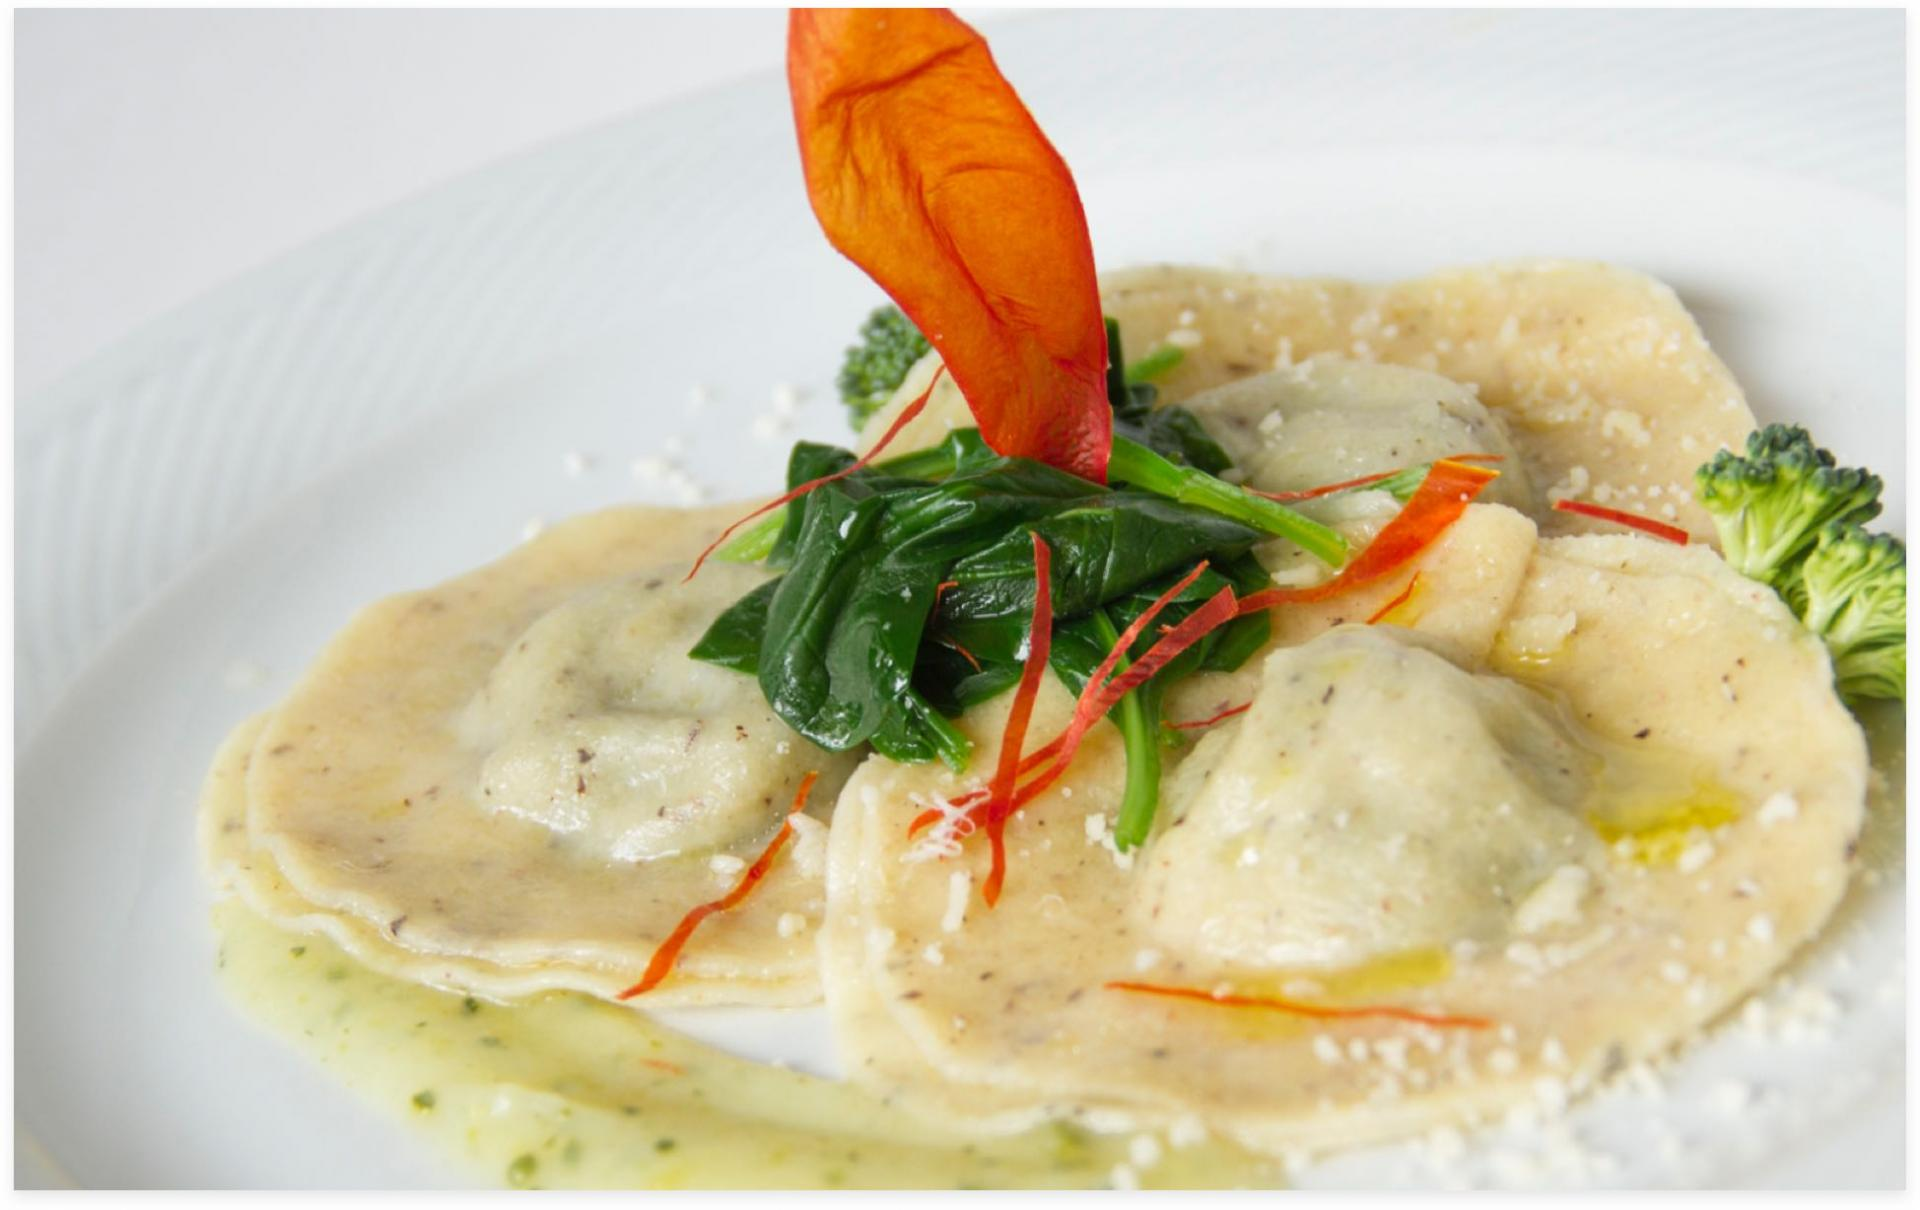 Cucina hotel genzianella val di fiemme dolomiti for Cucina trentino